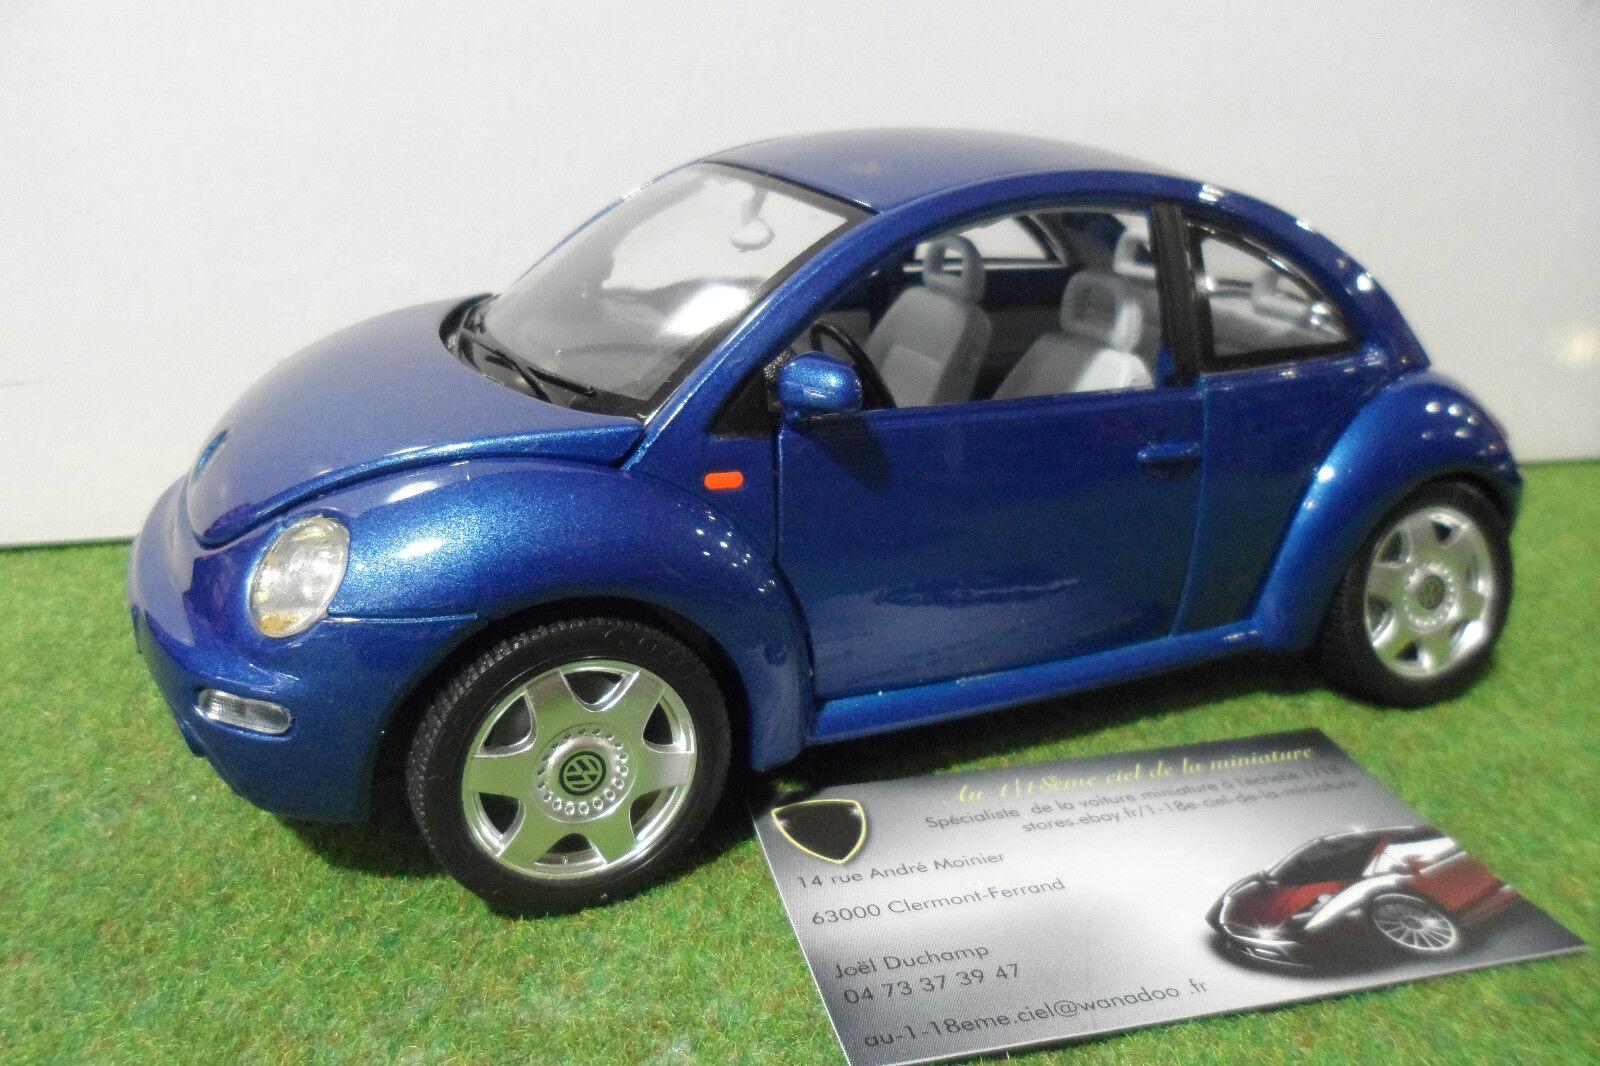 VOLKSWAGEN NEW BEETLE blu Coccinelle 1 18 BURAGO voiture avec system éclairage